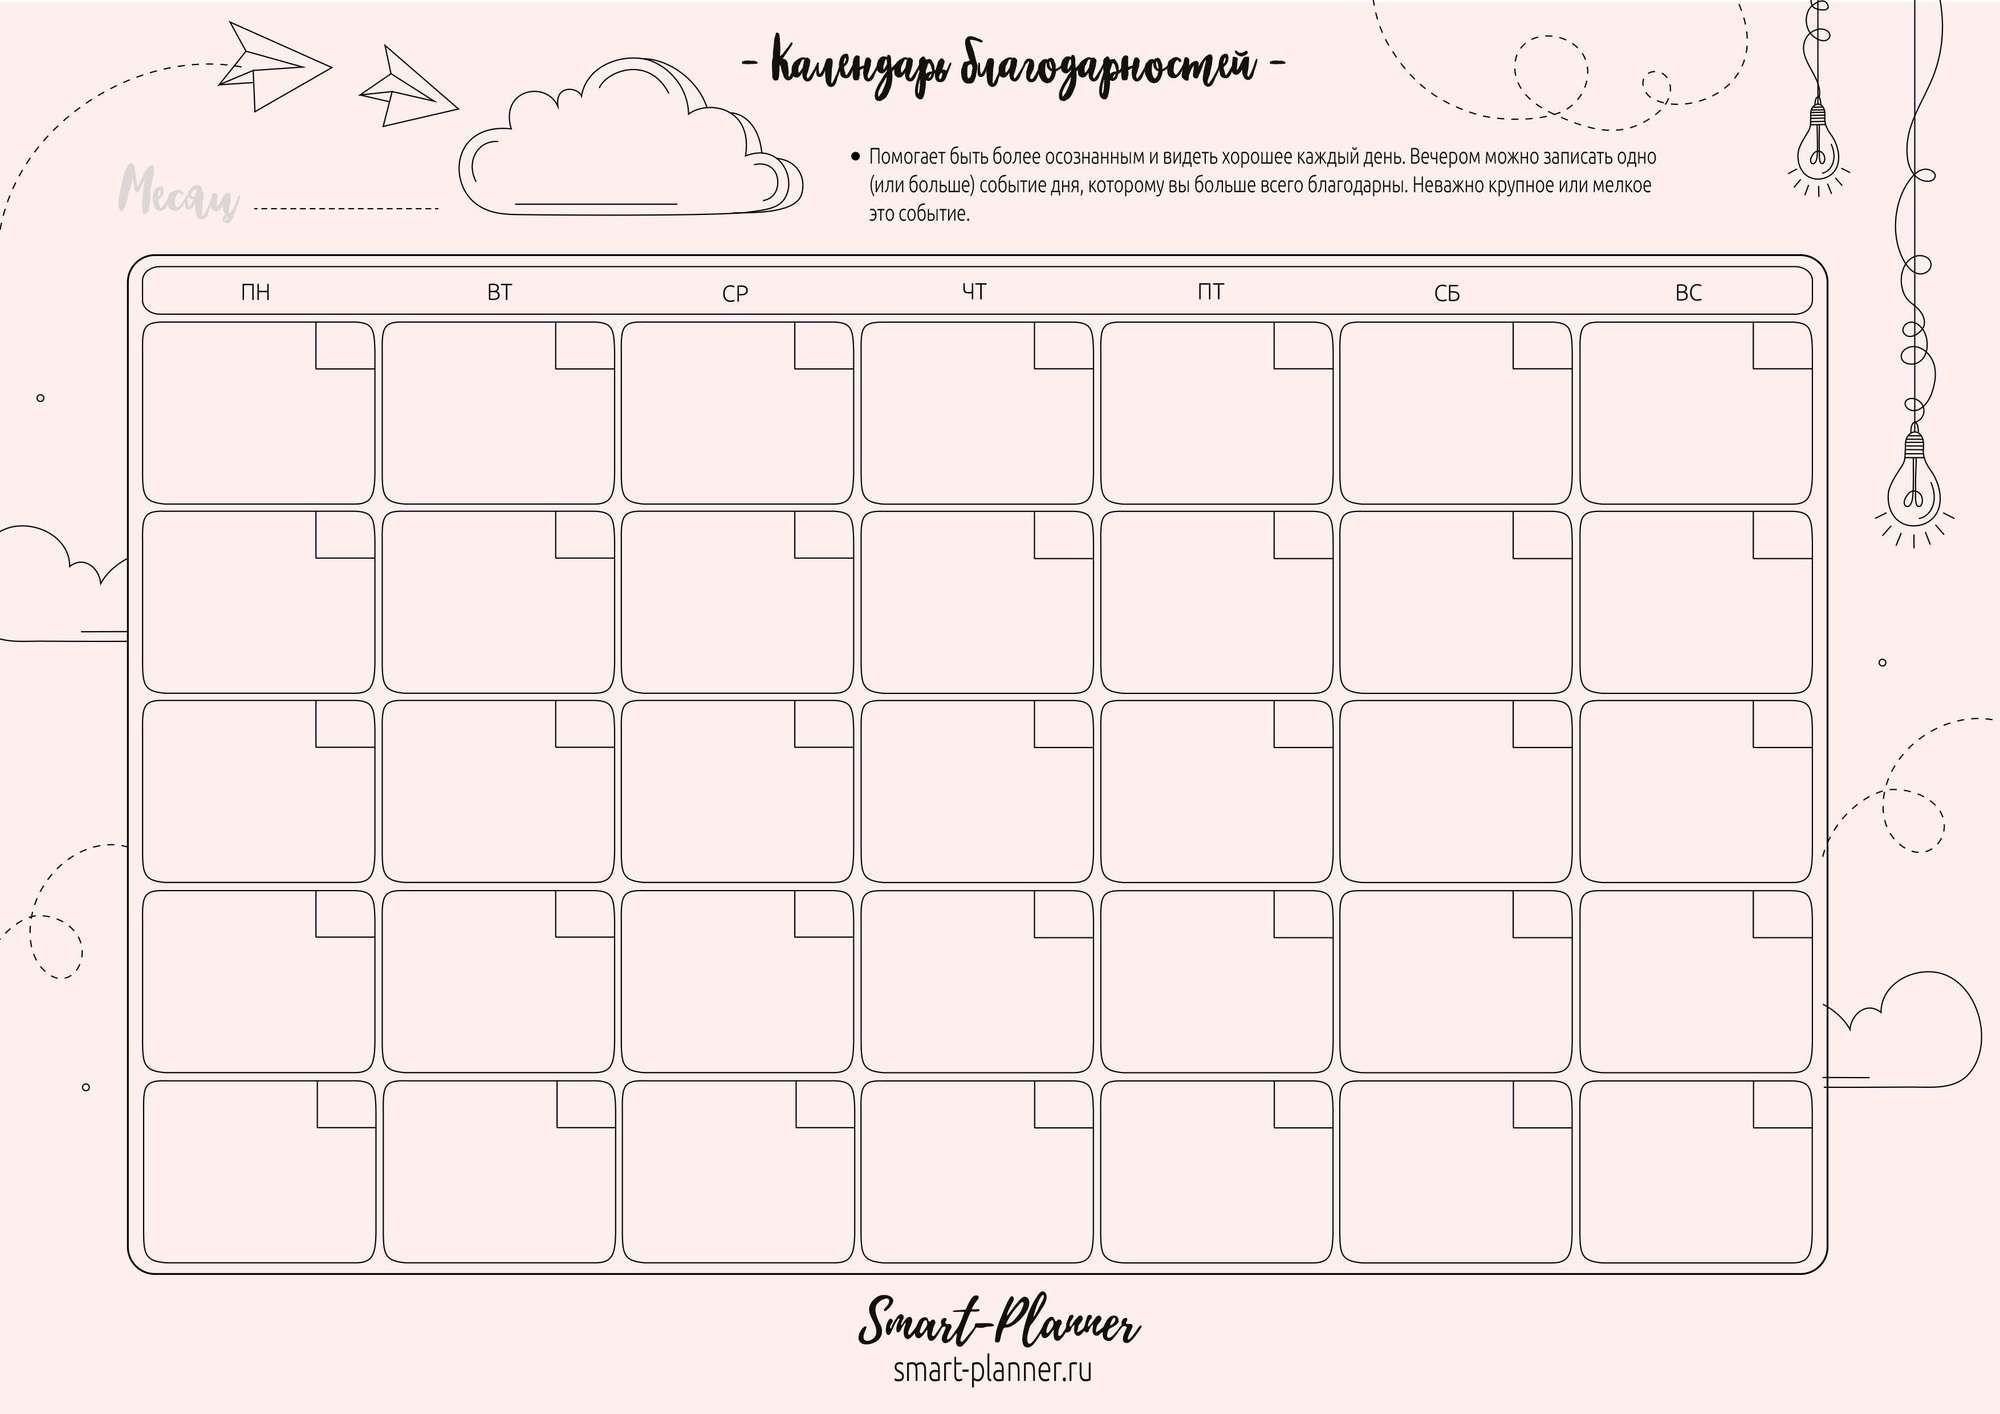 Картинка чек лист и календарь они были